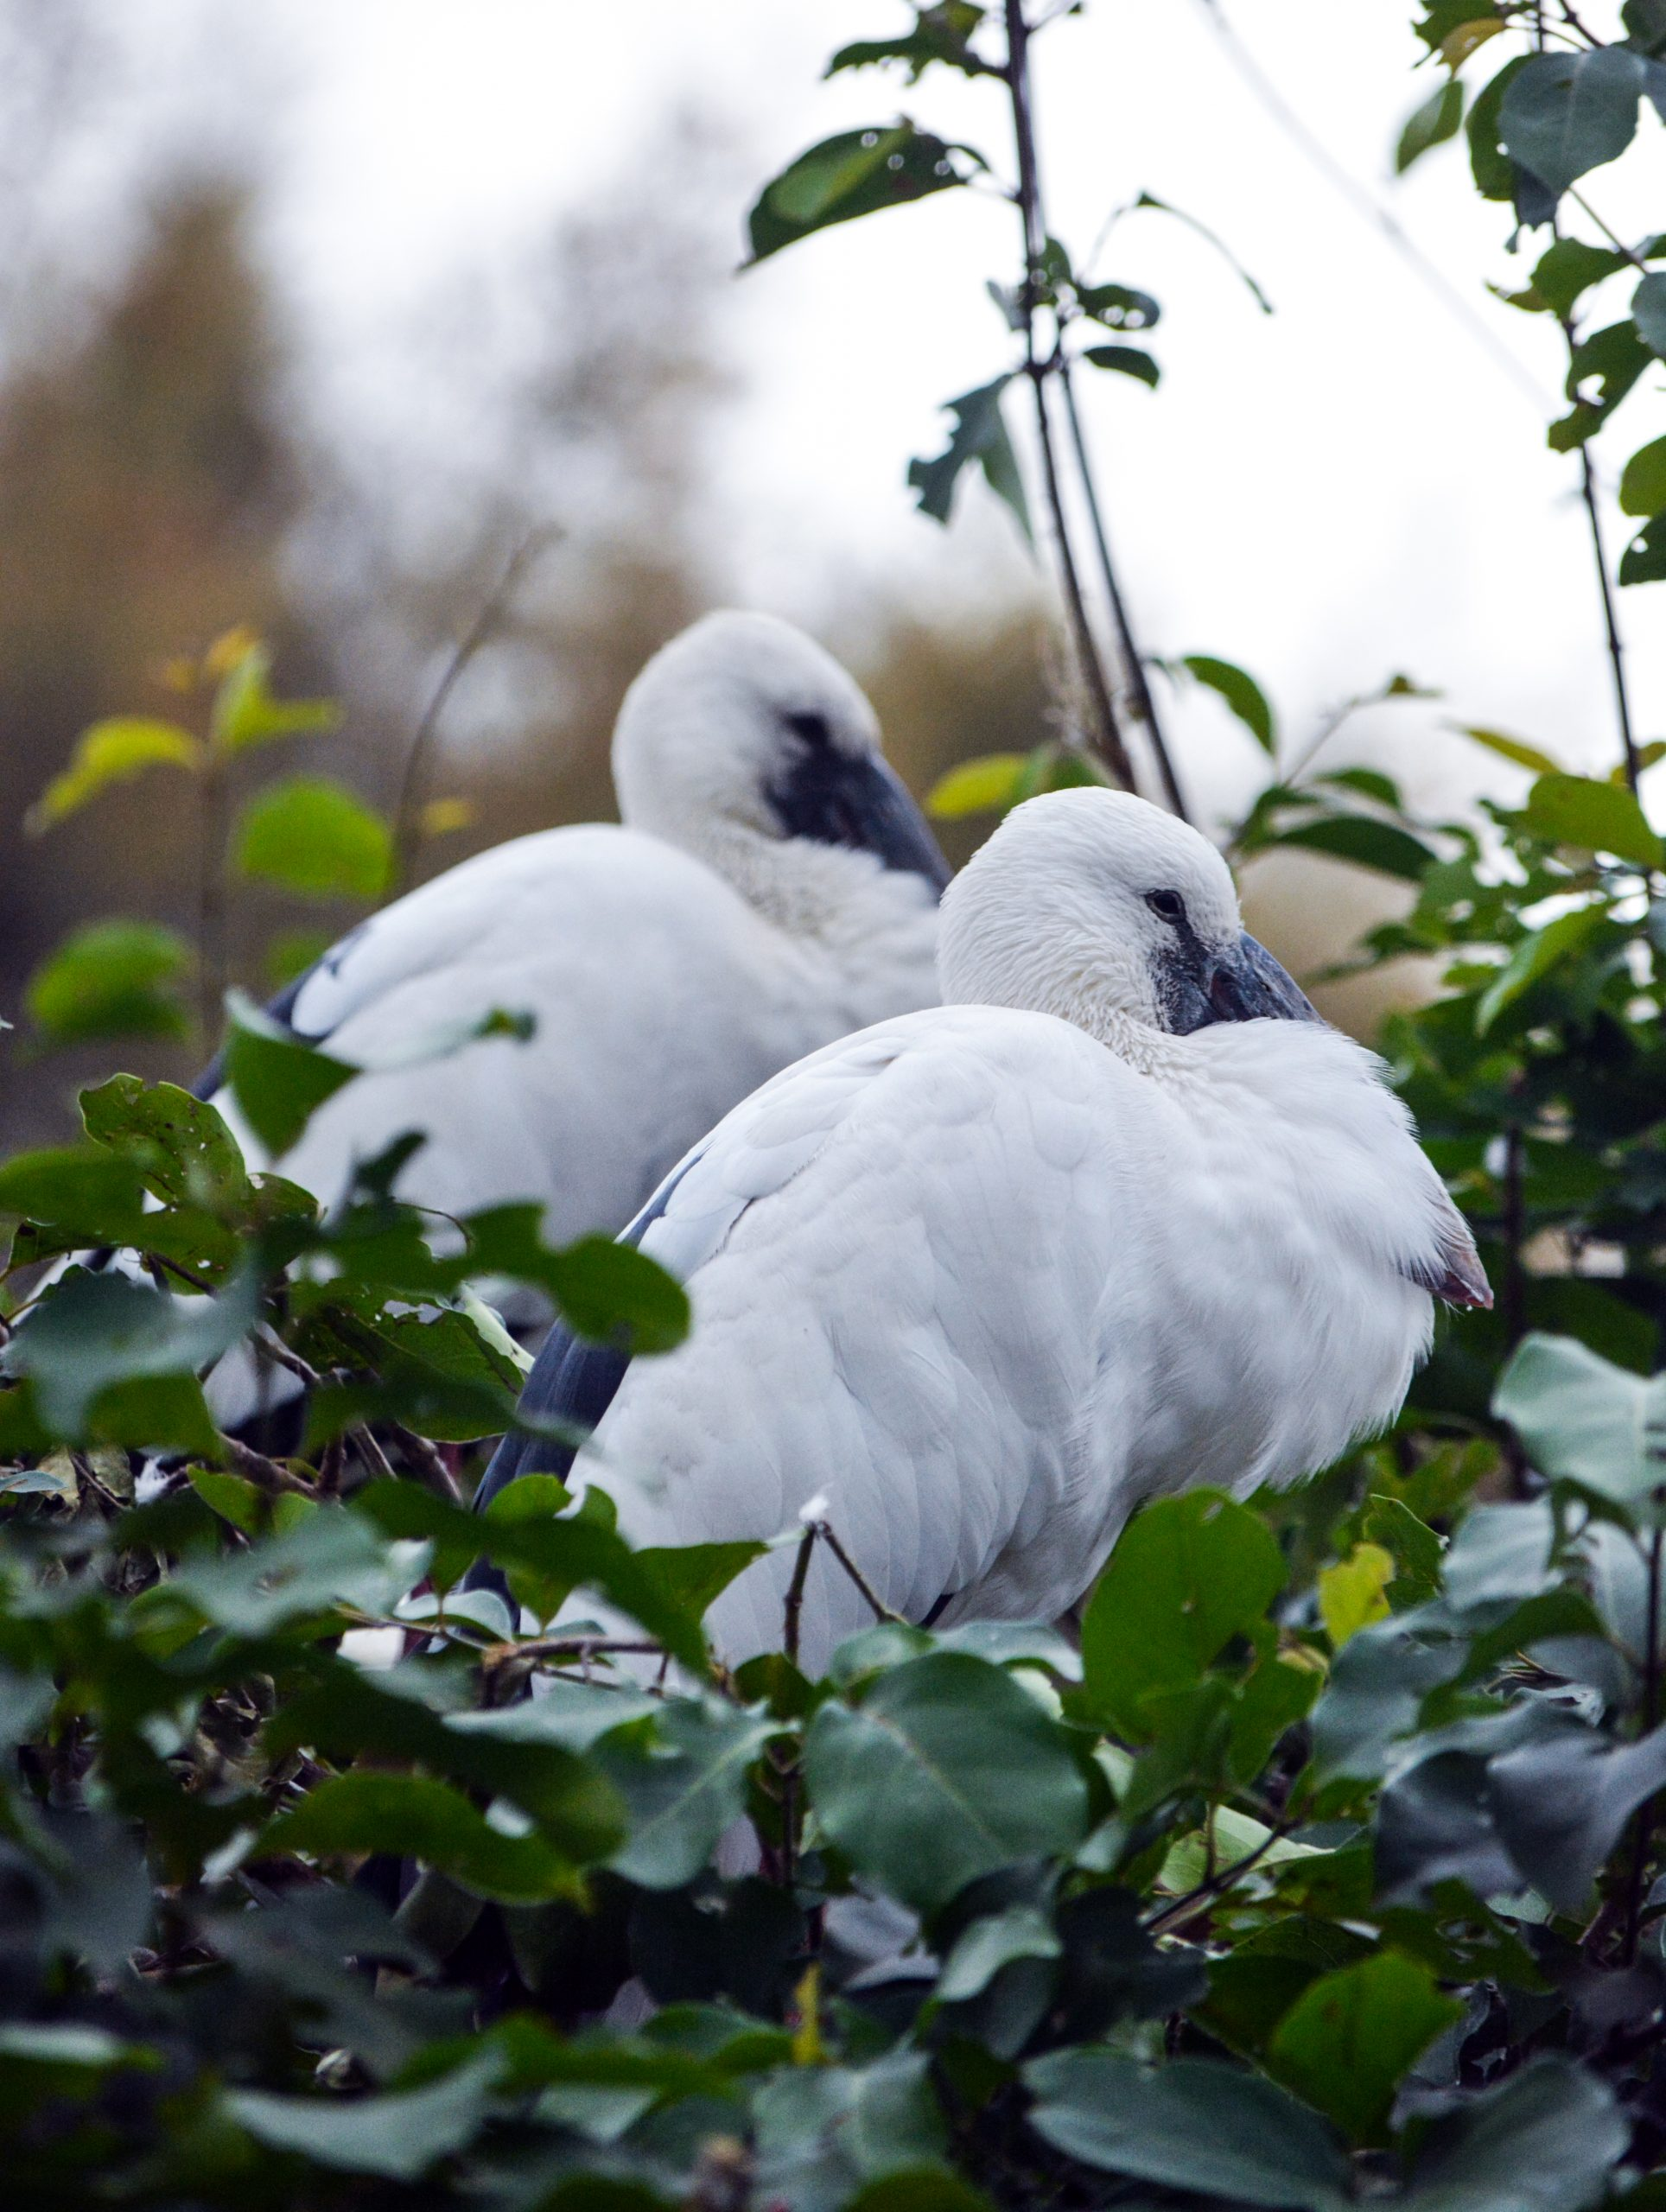 birds sitting in a park